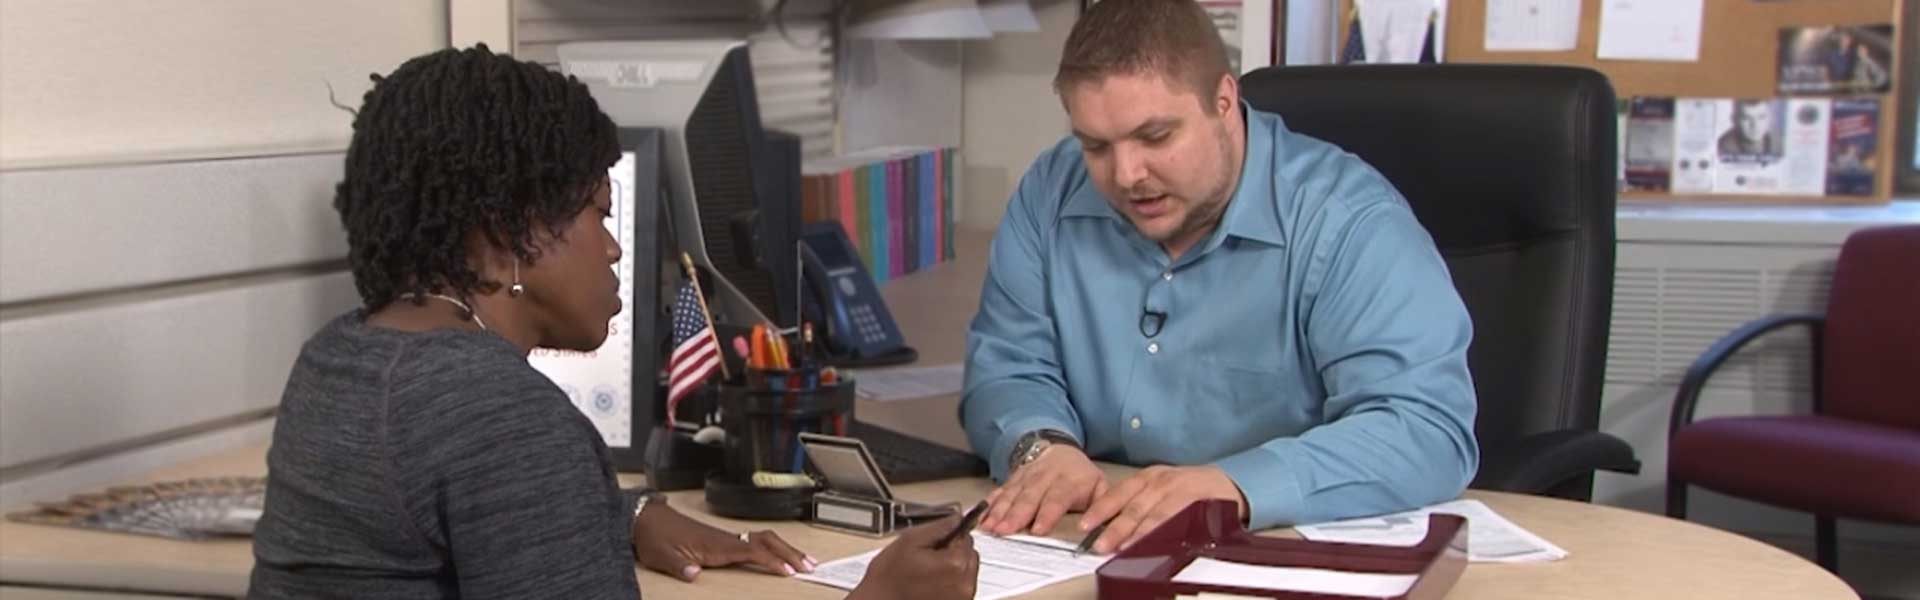 VA Claims & Separation Benefits - VFW